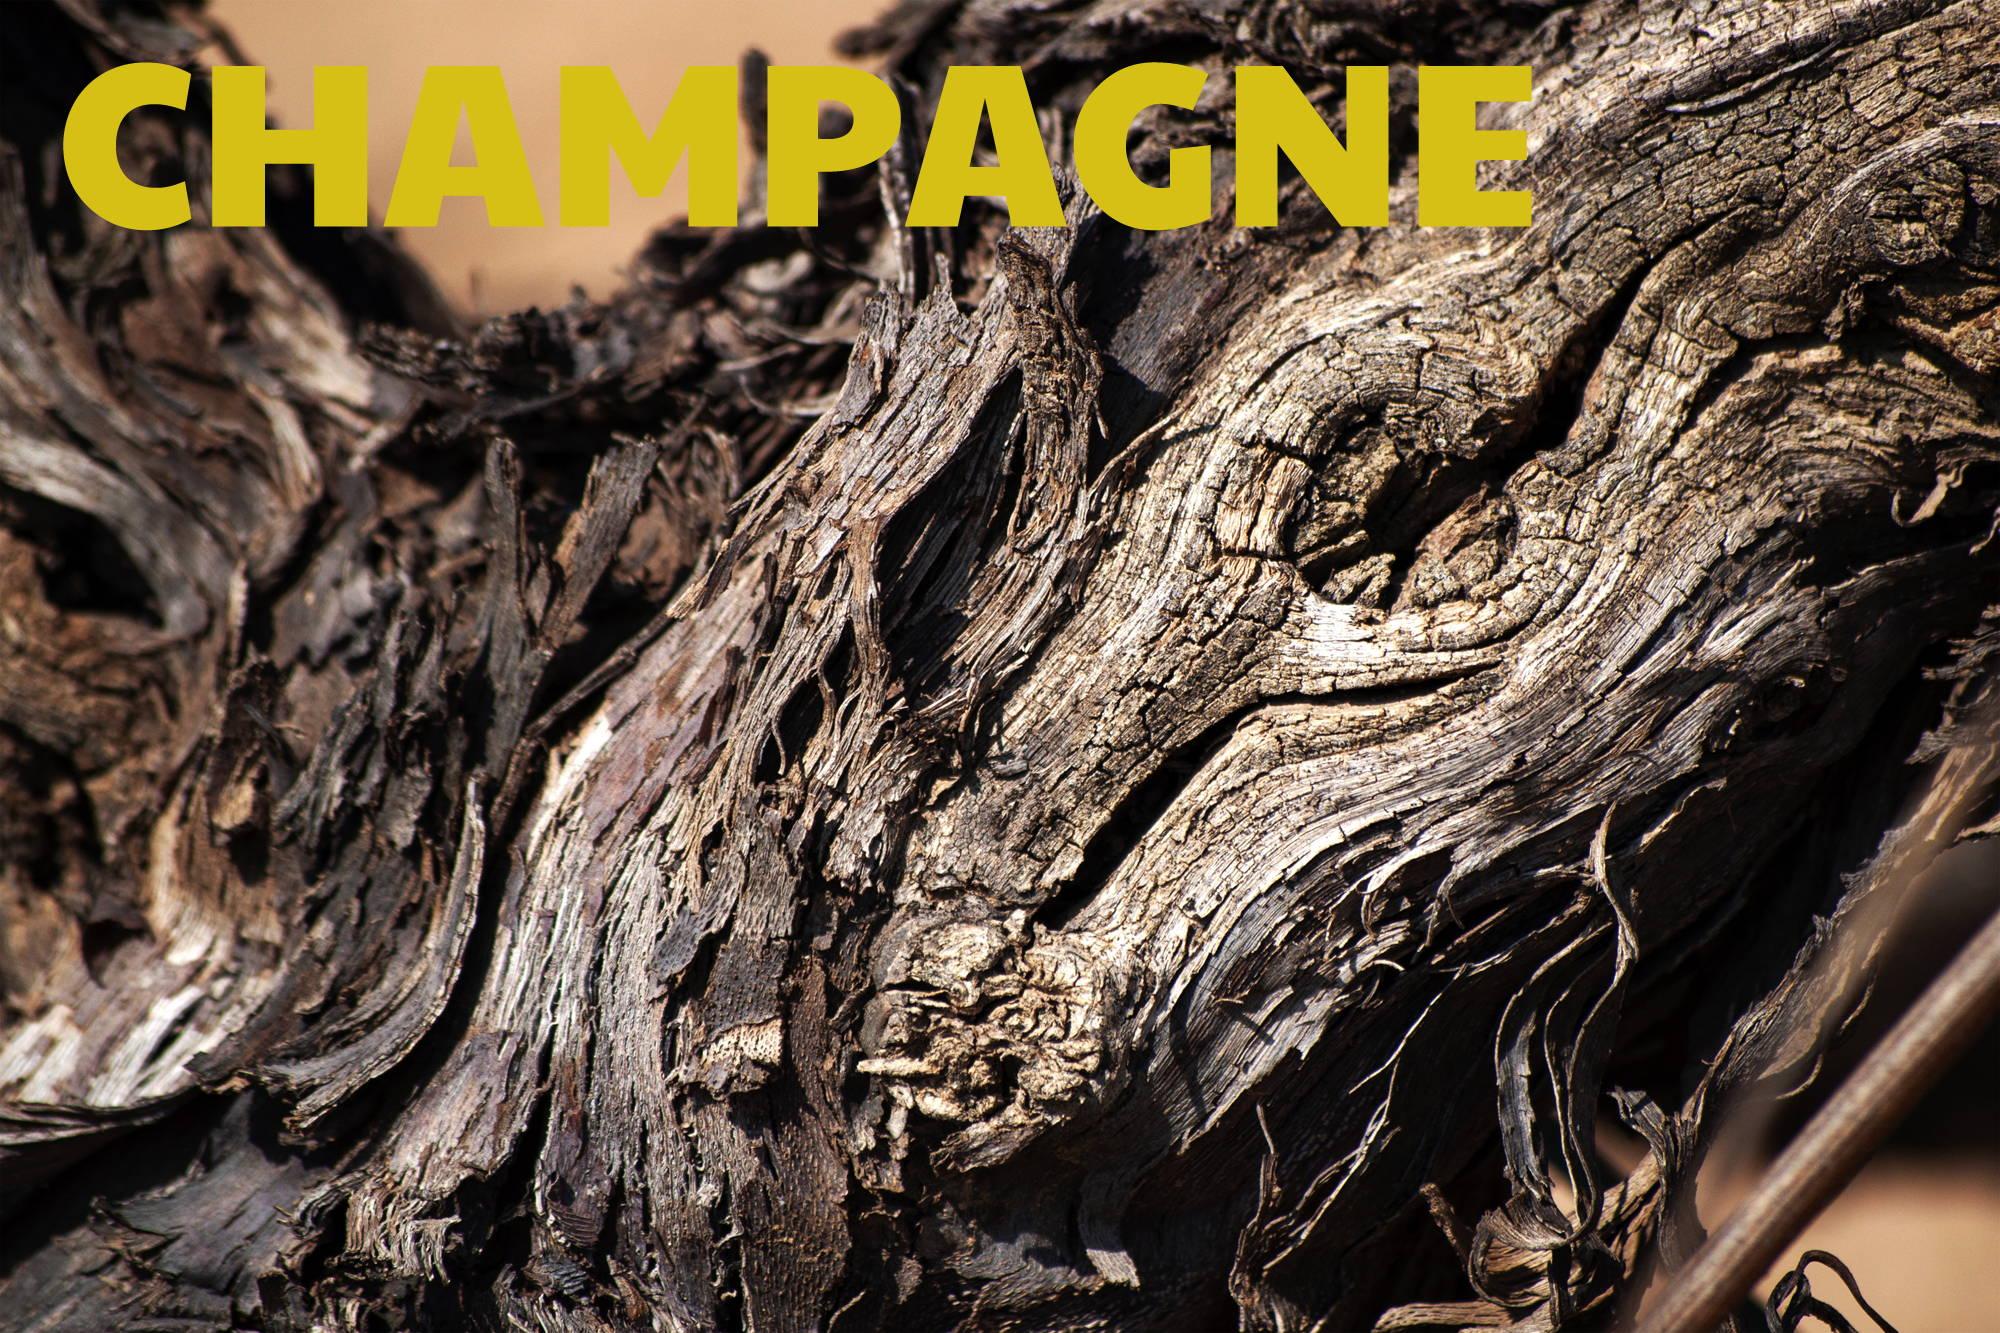 France, vin nature, rawwine, organic wine, vin bio, vin sans intrants, bistro brute, vin rouge, vin blanc, rouge, blanc, nature, vin propre, vigneron, vigneron indépendant, domaine bio, biodynamie, vigneron nature, cave vin naturel, cave vin, caviste, vin biodynamique, bistro brute, Quimper, Finistère , champagne, herve rafflin